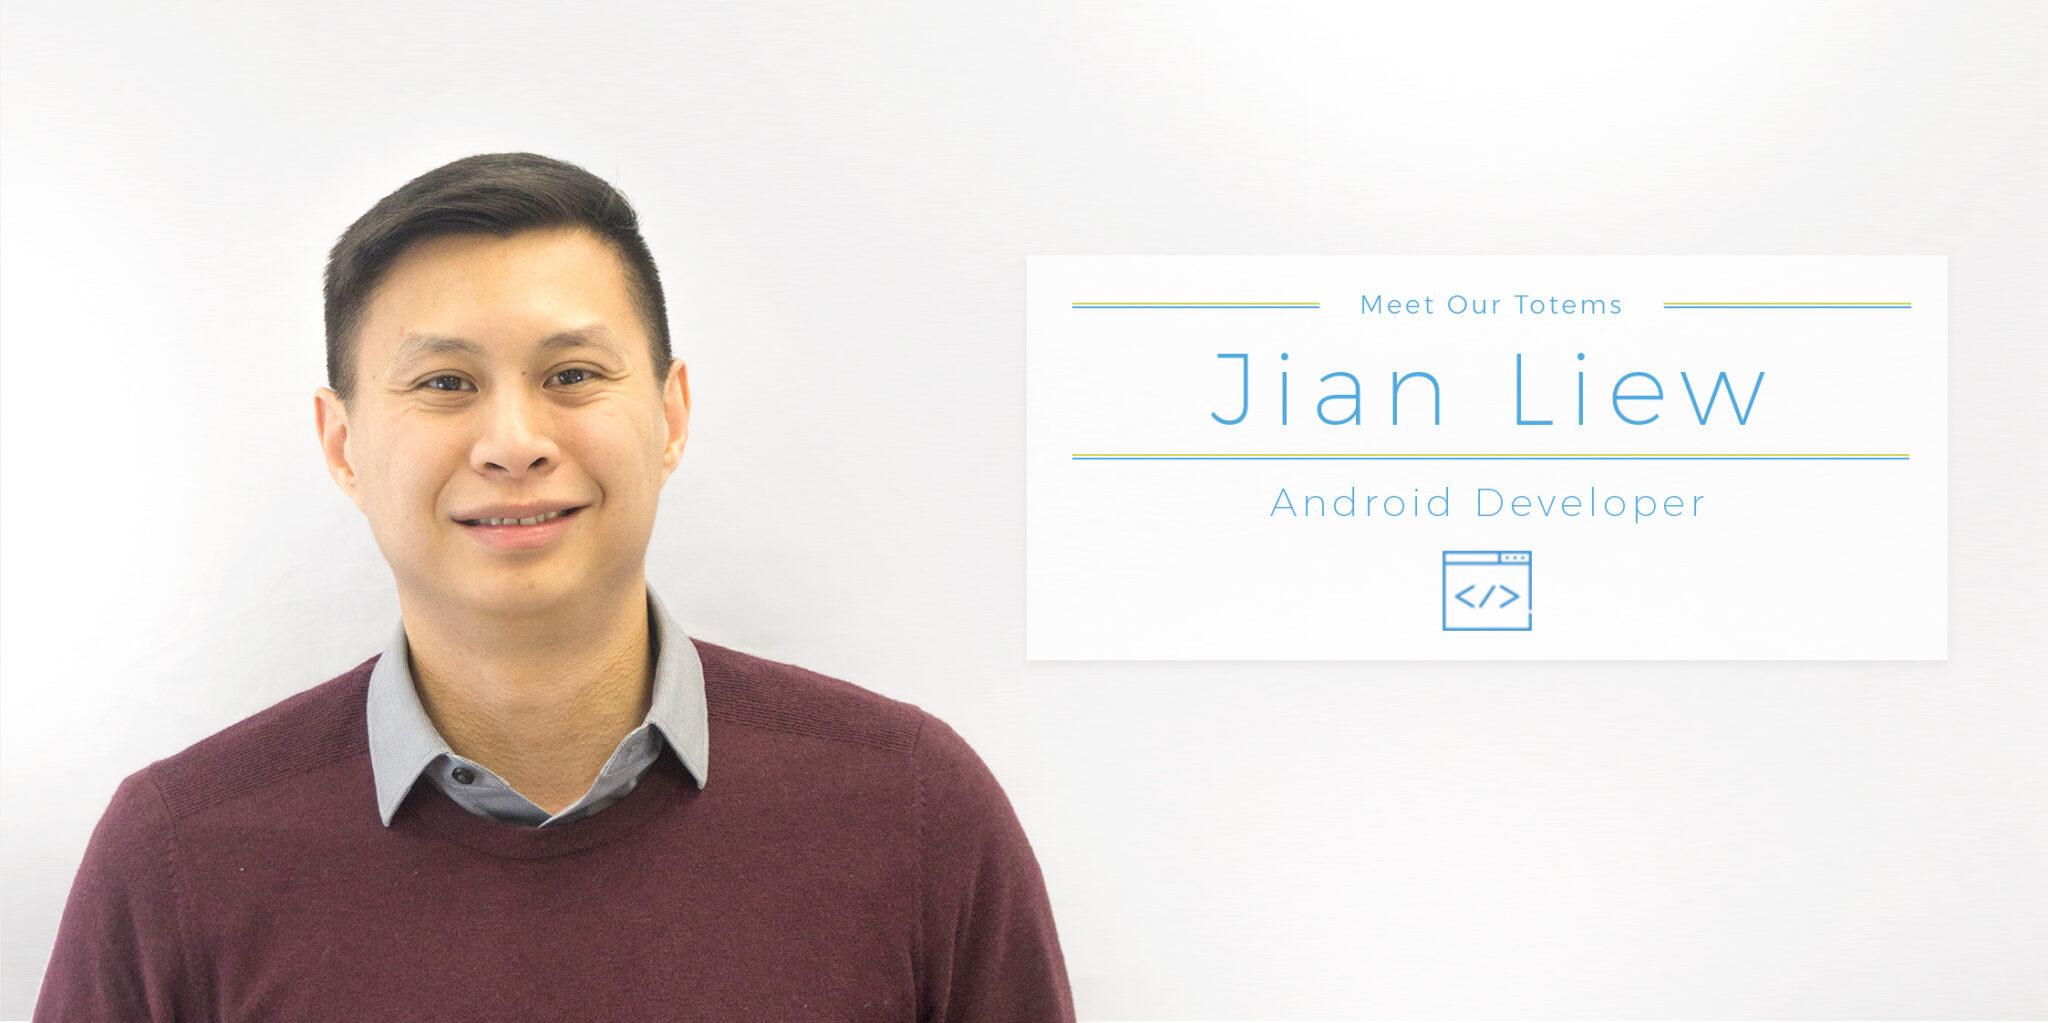 Meet Our Totems – Jian